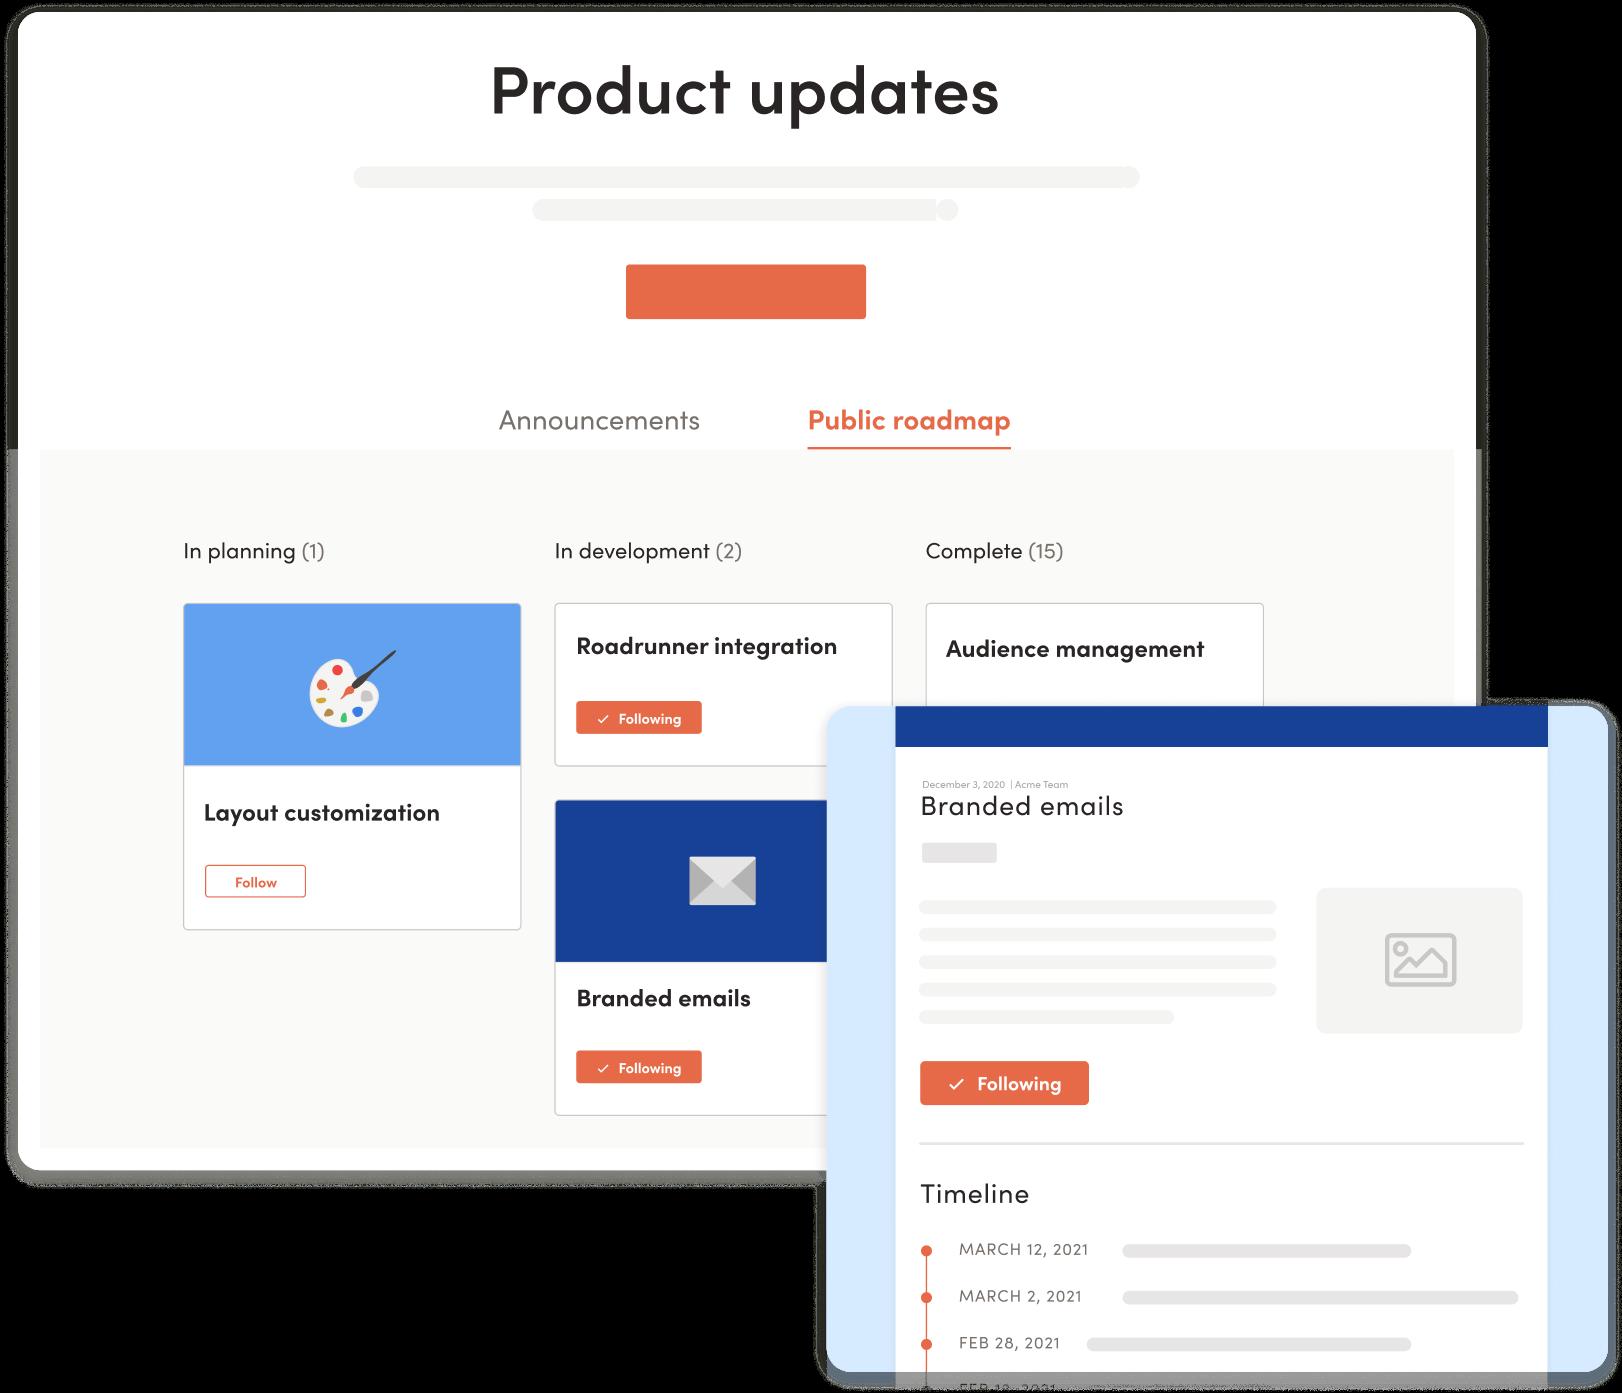 LaunchNotes categories